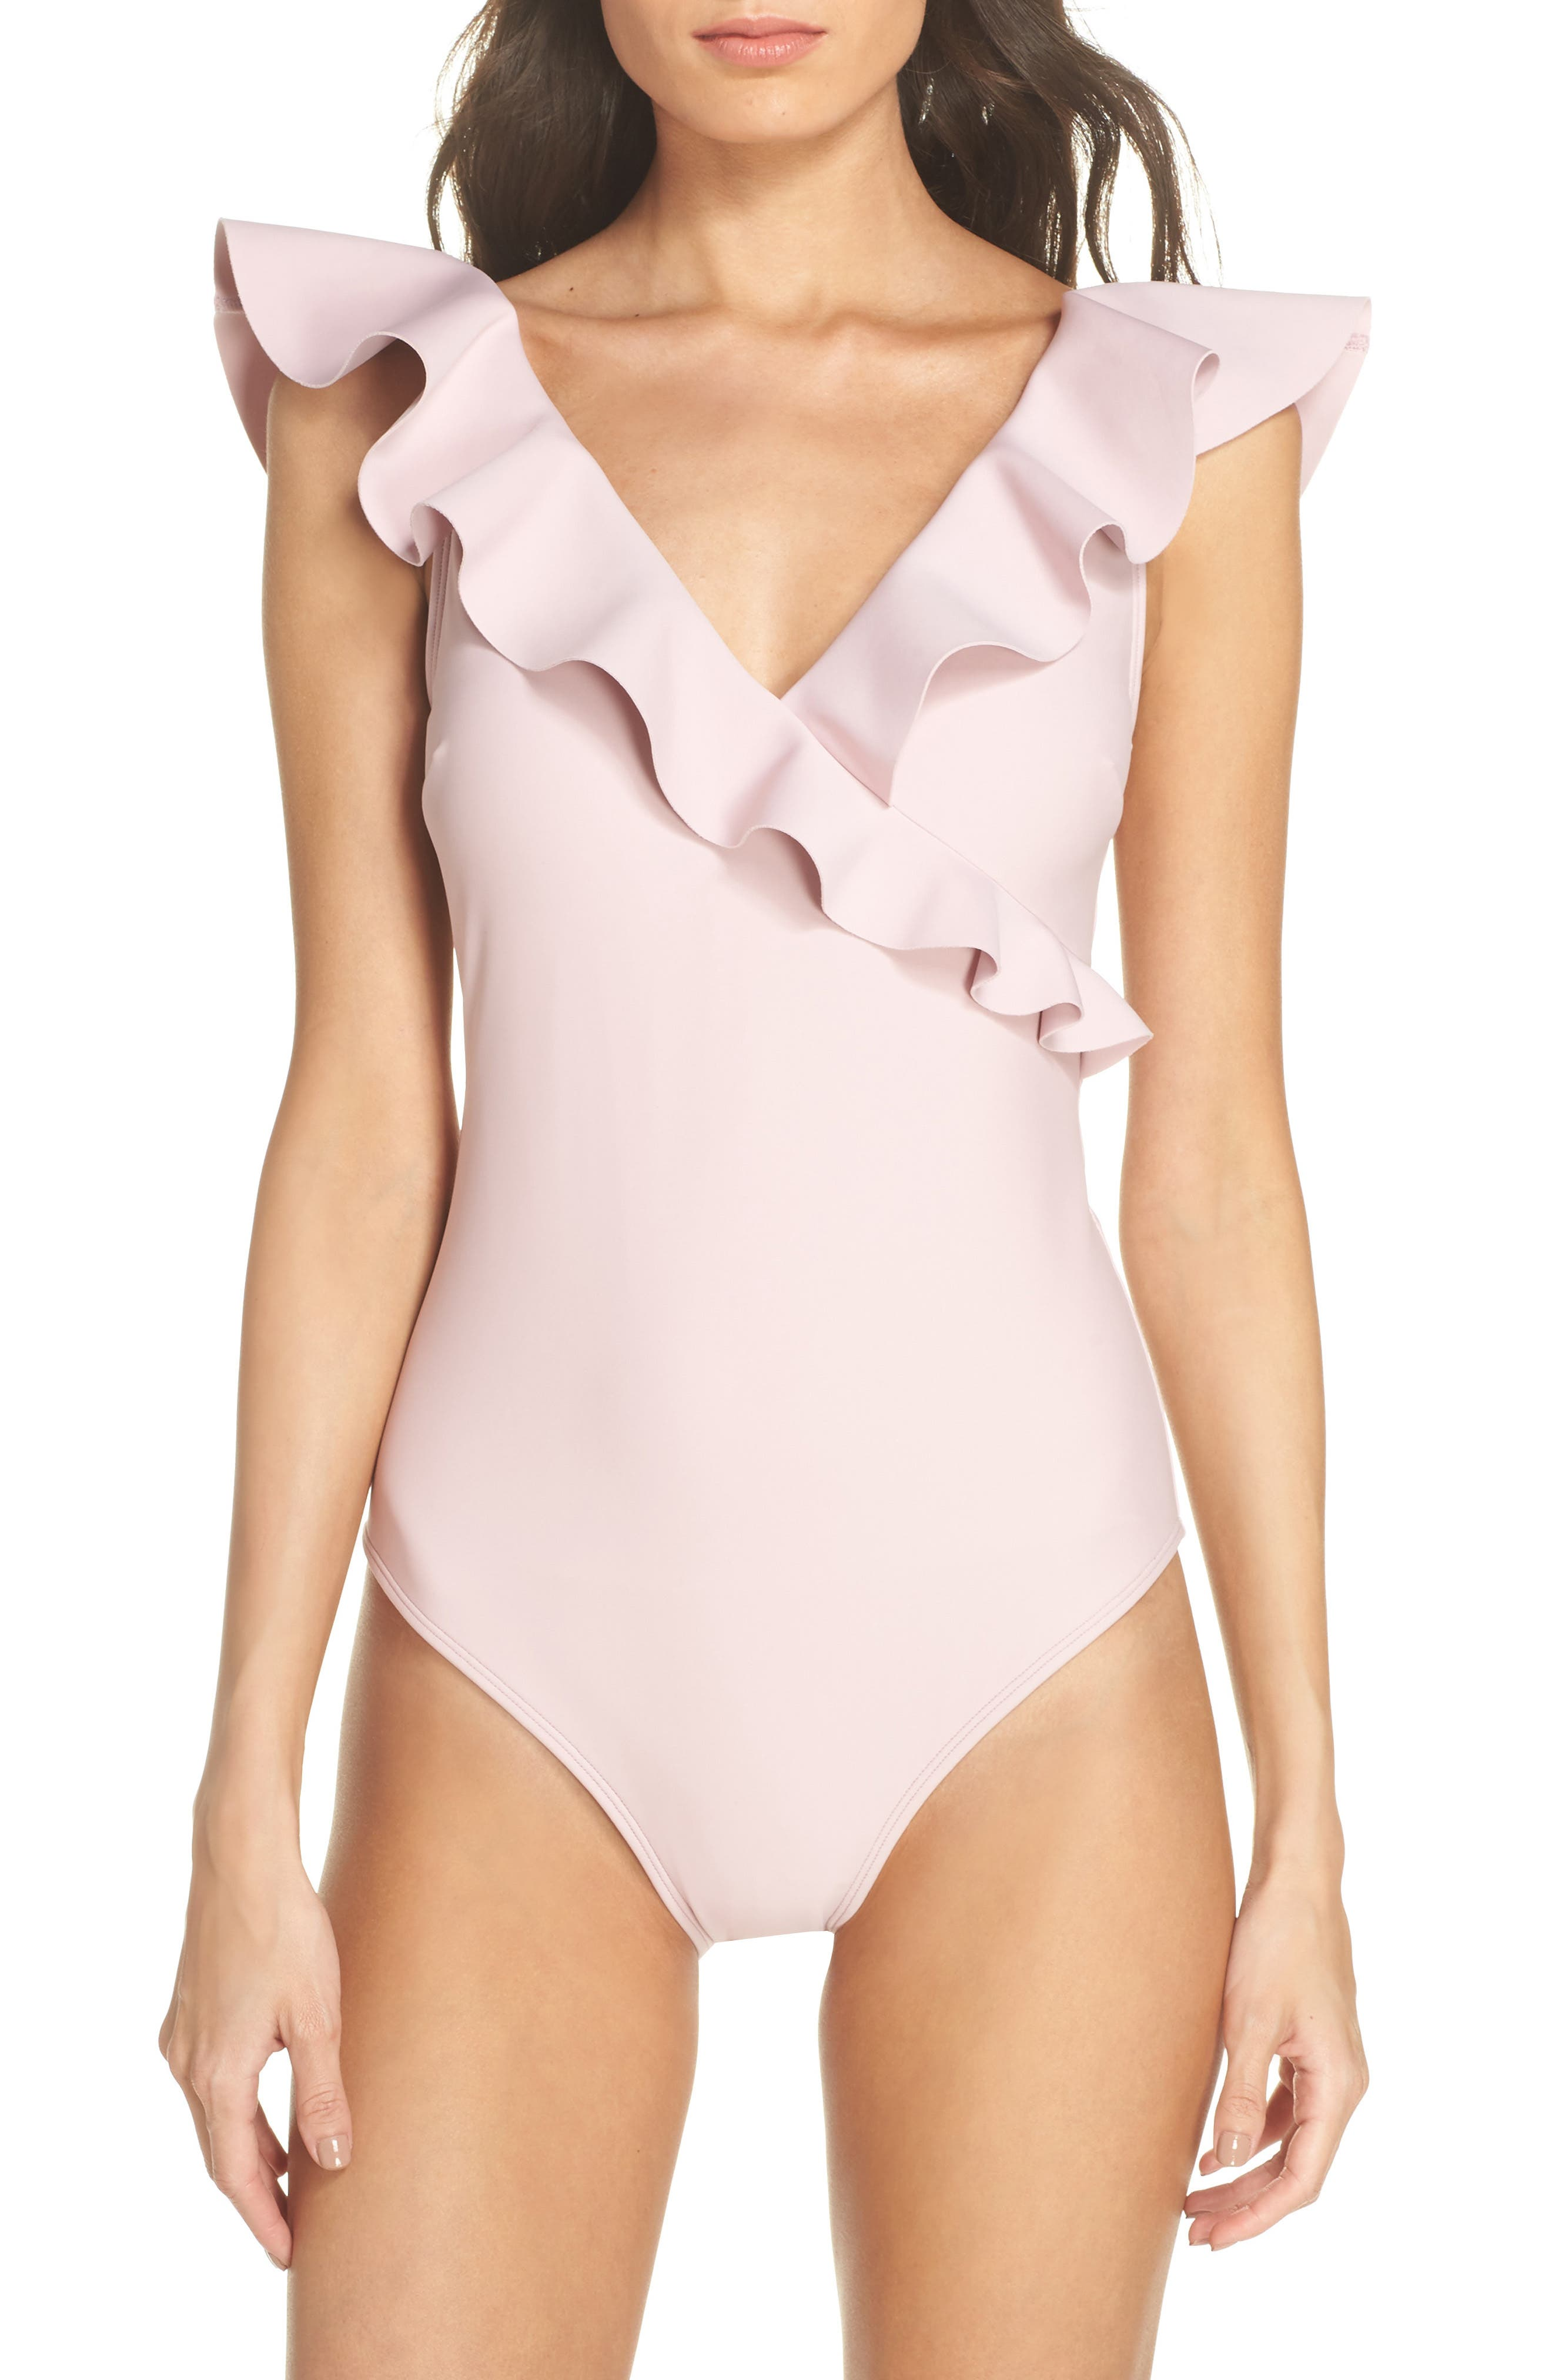 Henika One-Piece Swimsuit,                             Main thumbnail 1, color,                             Dusky Pink